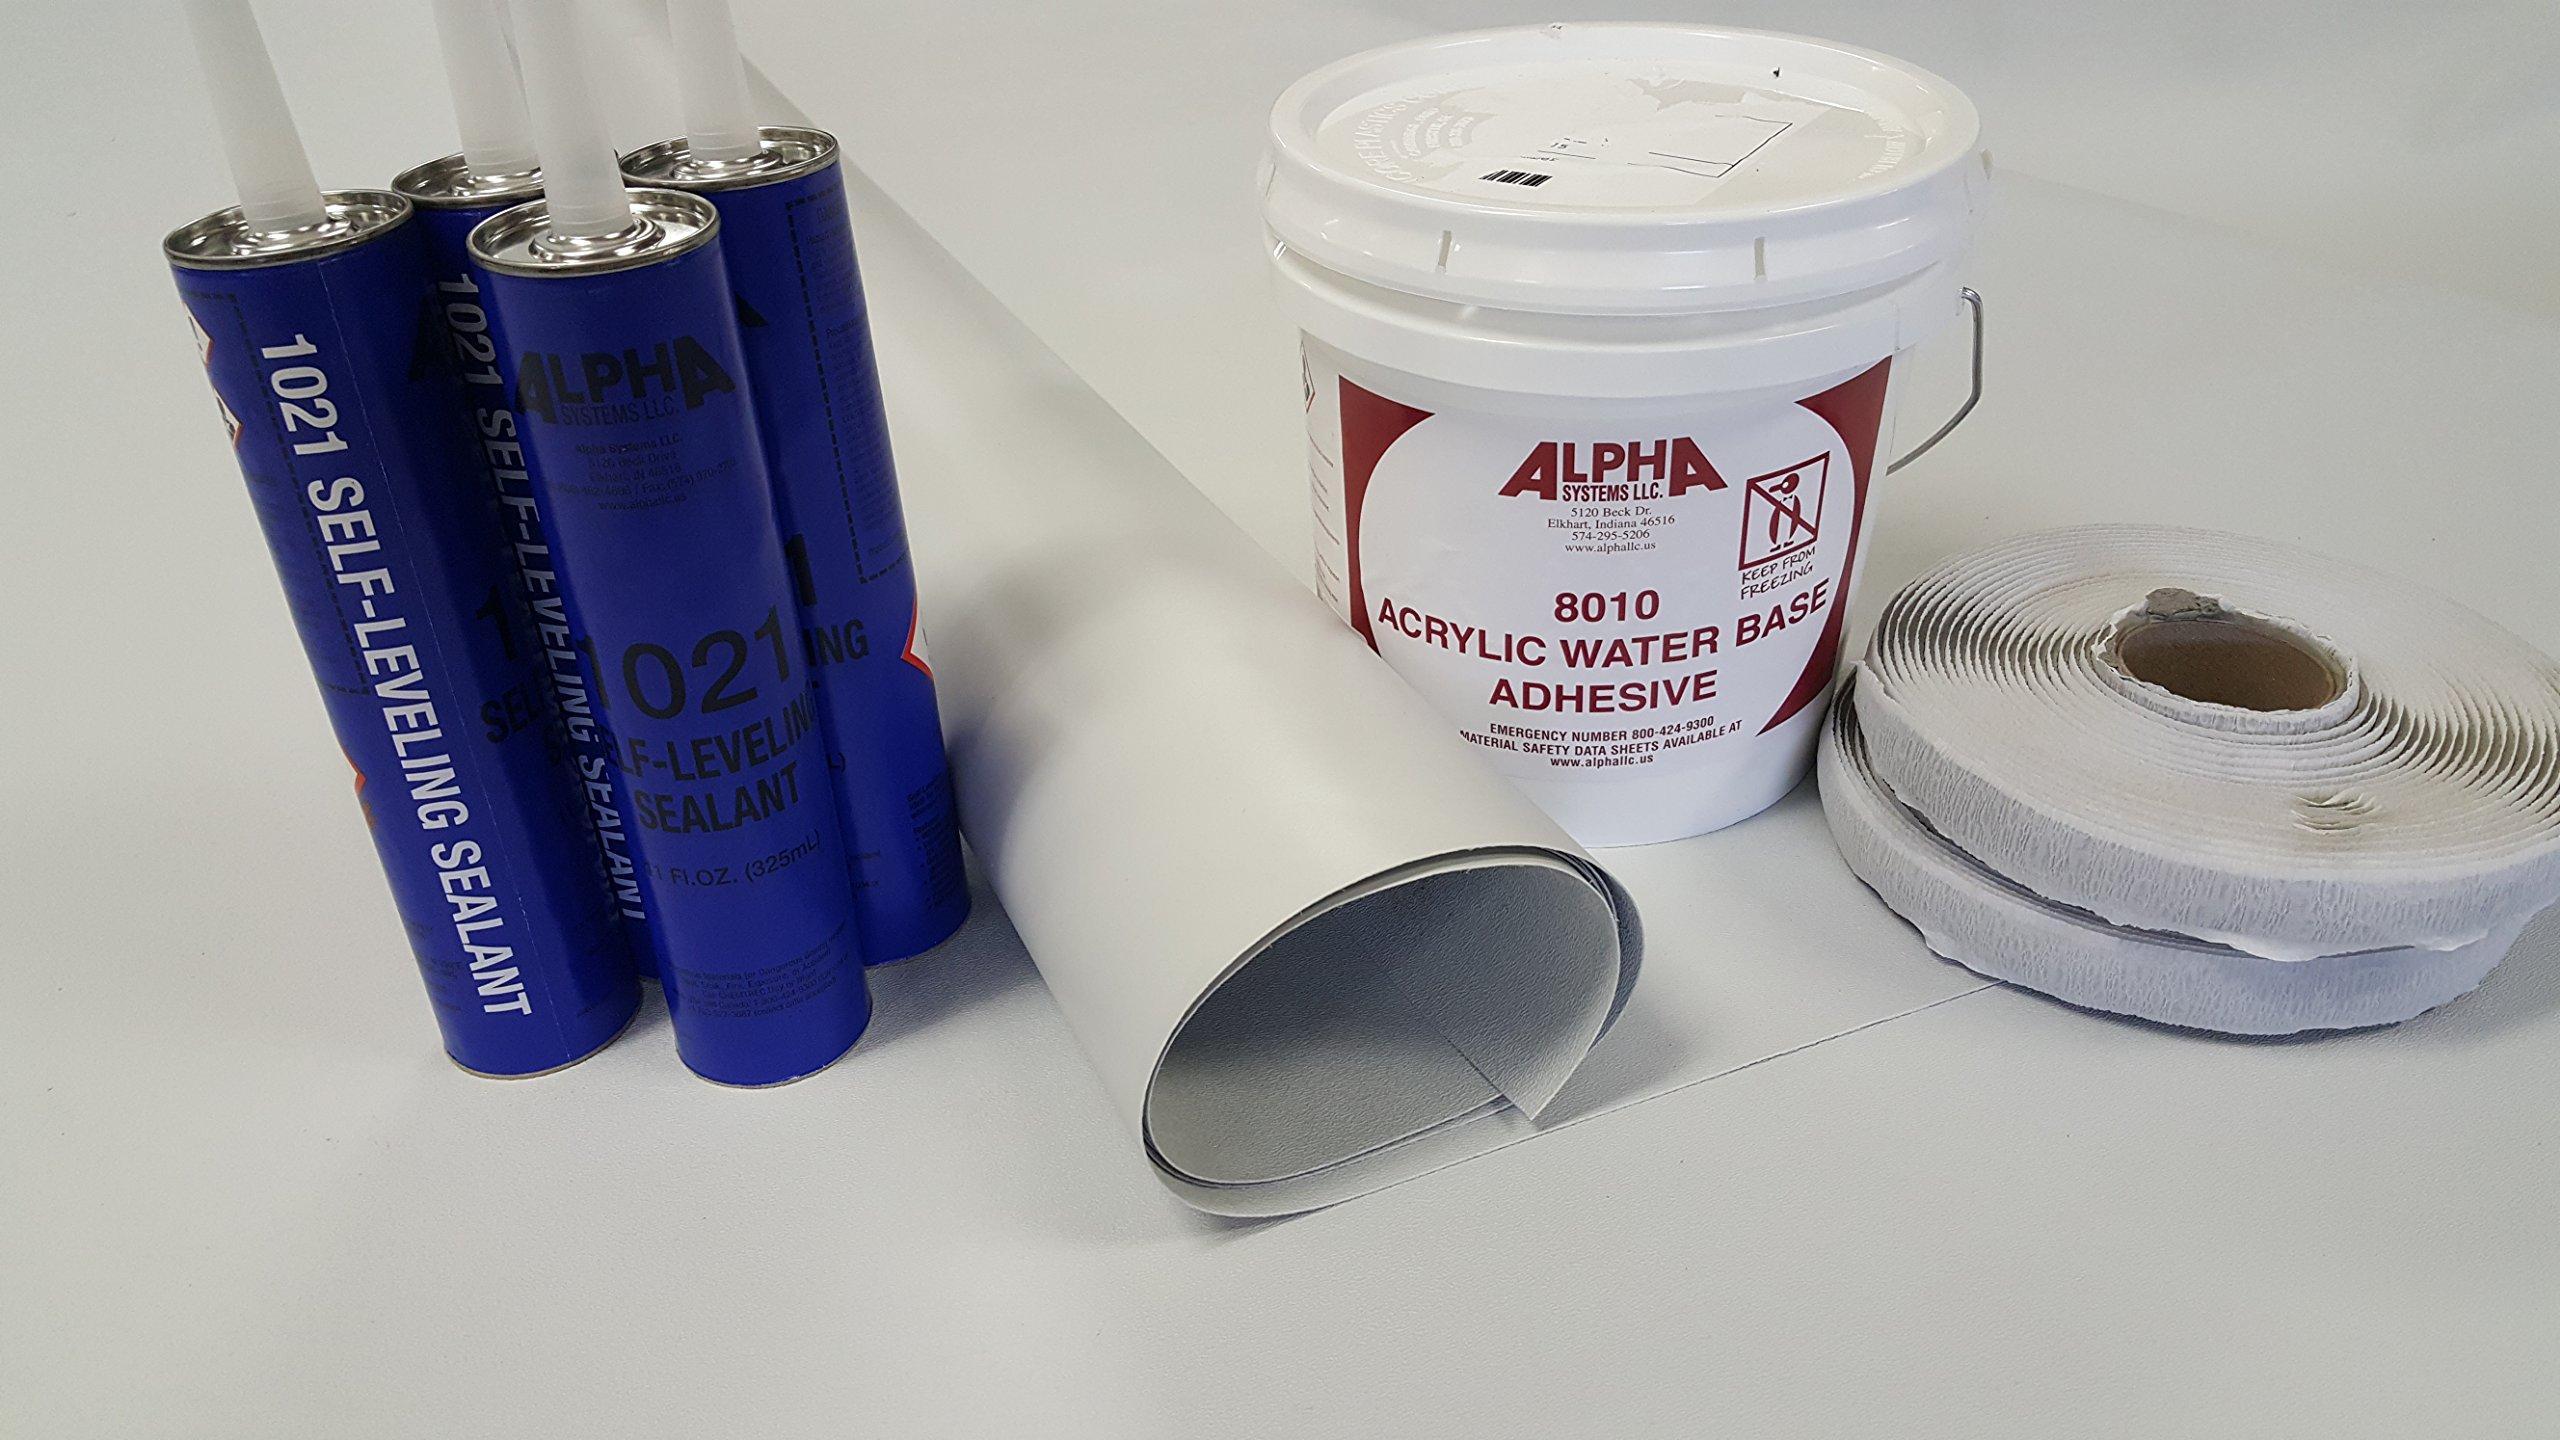 Superflex RV Rubber Roof Kit 8.5' X 20' Complete Kit